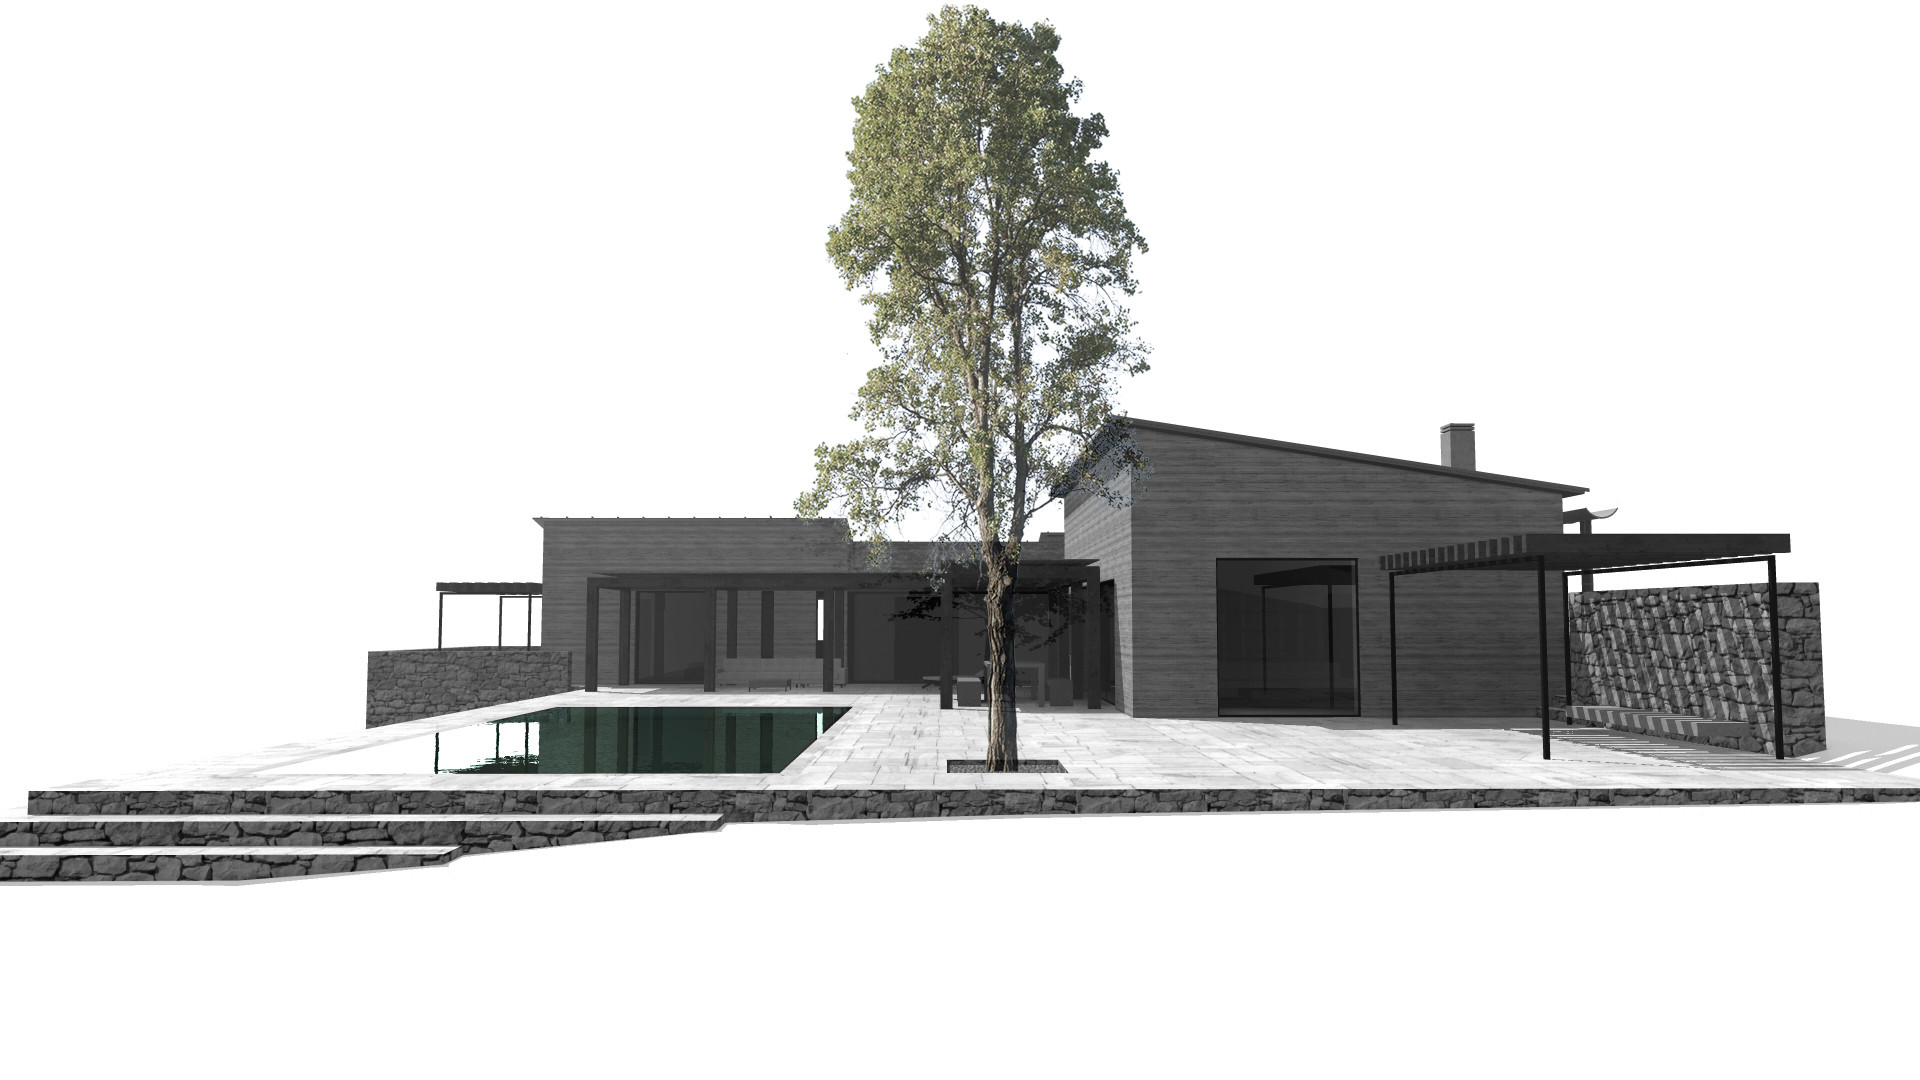 Country residence Alt.2/'00, Attica